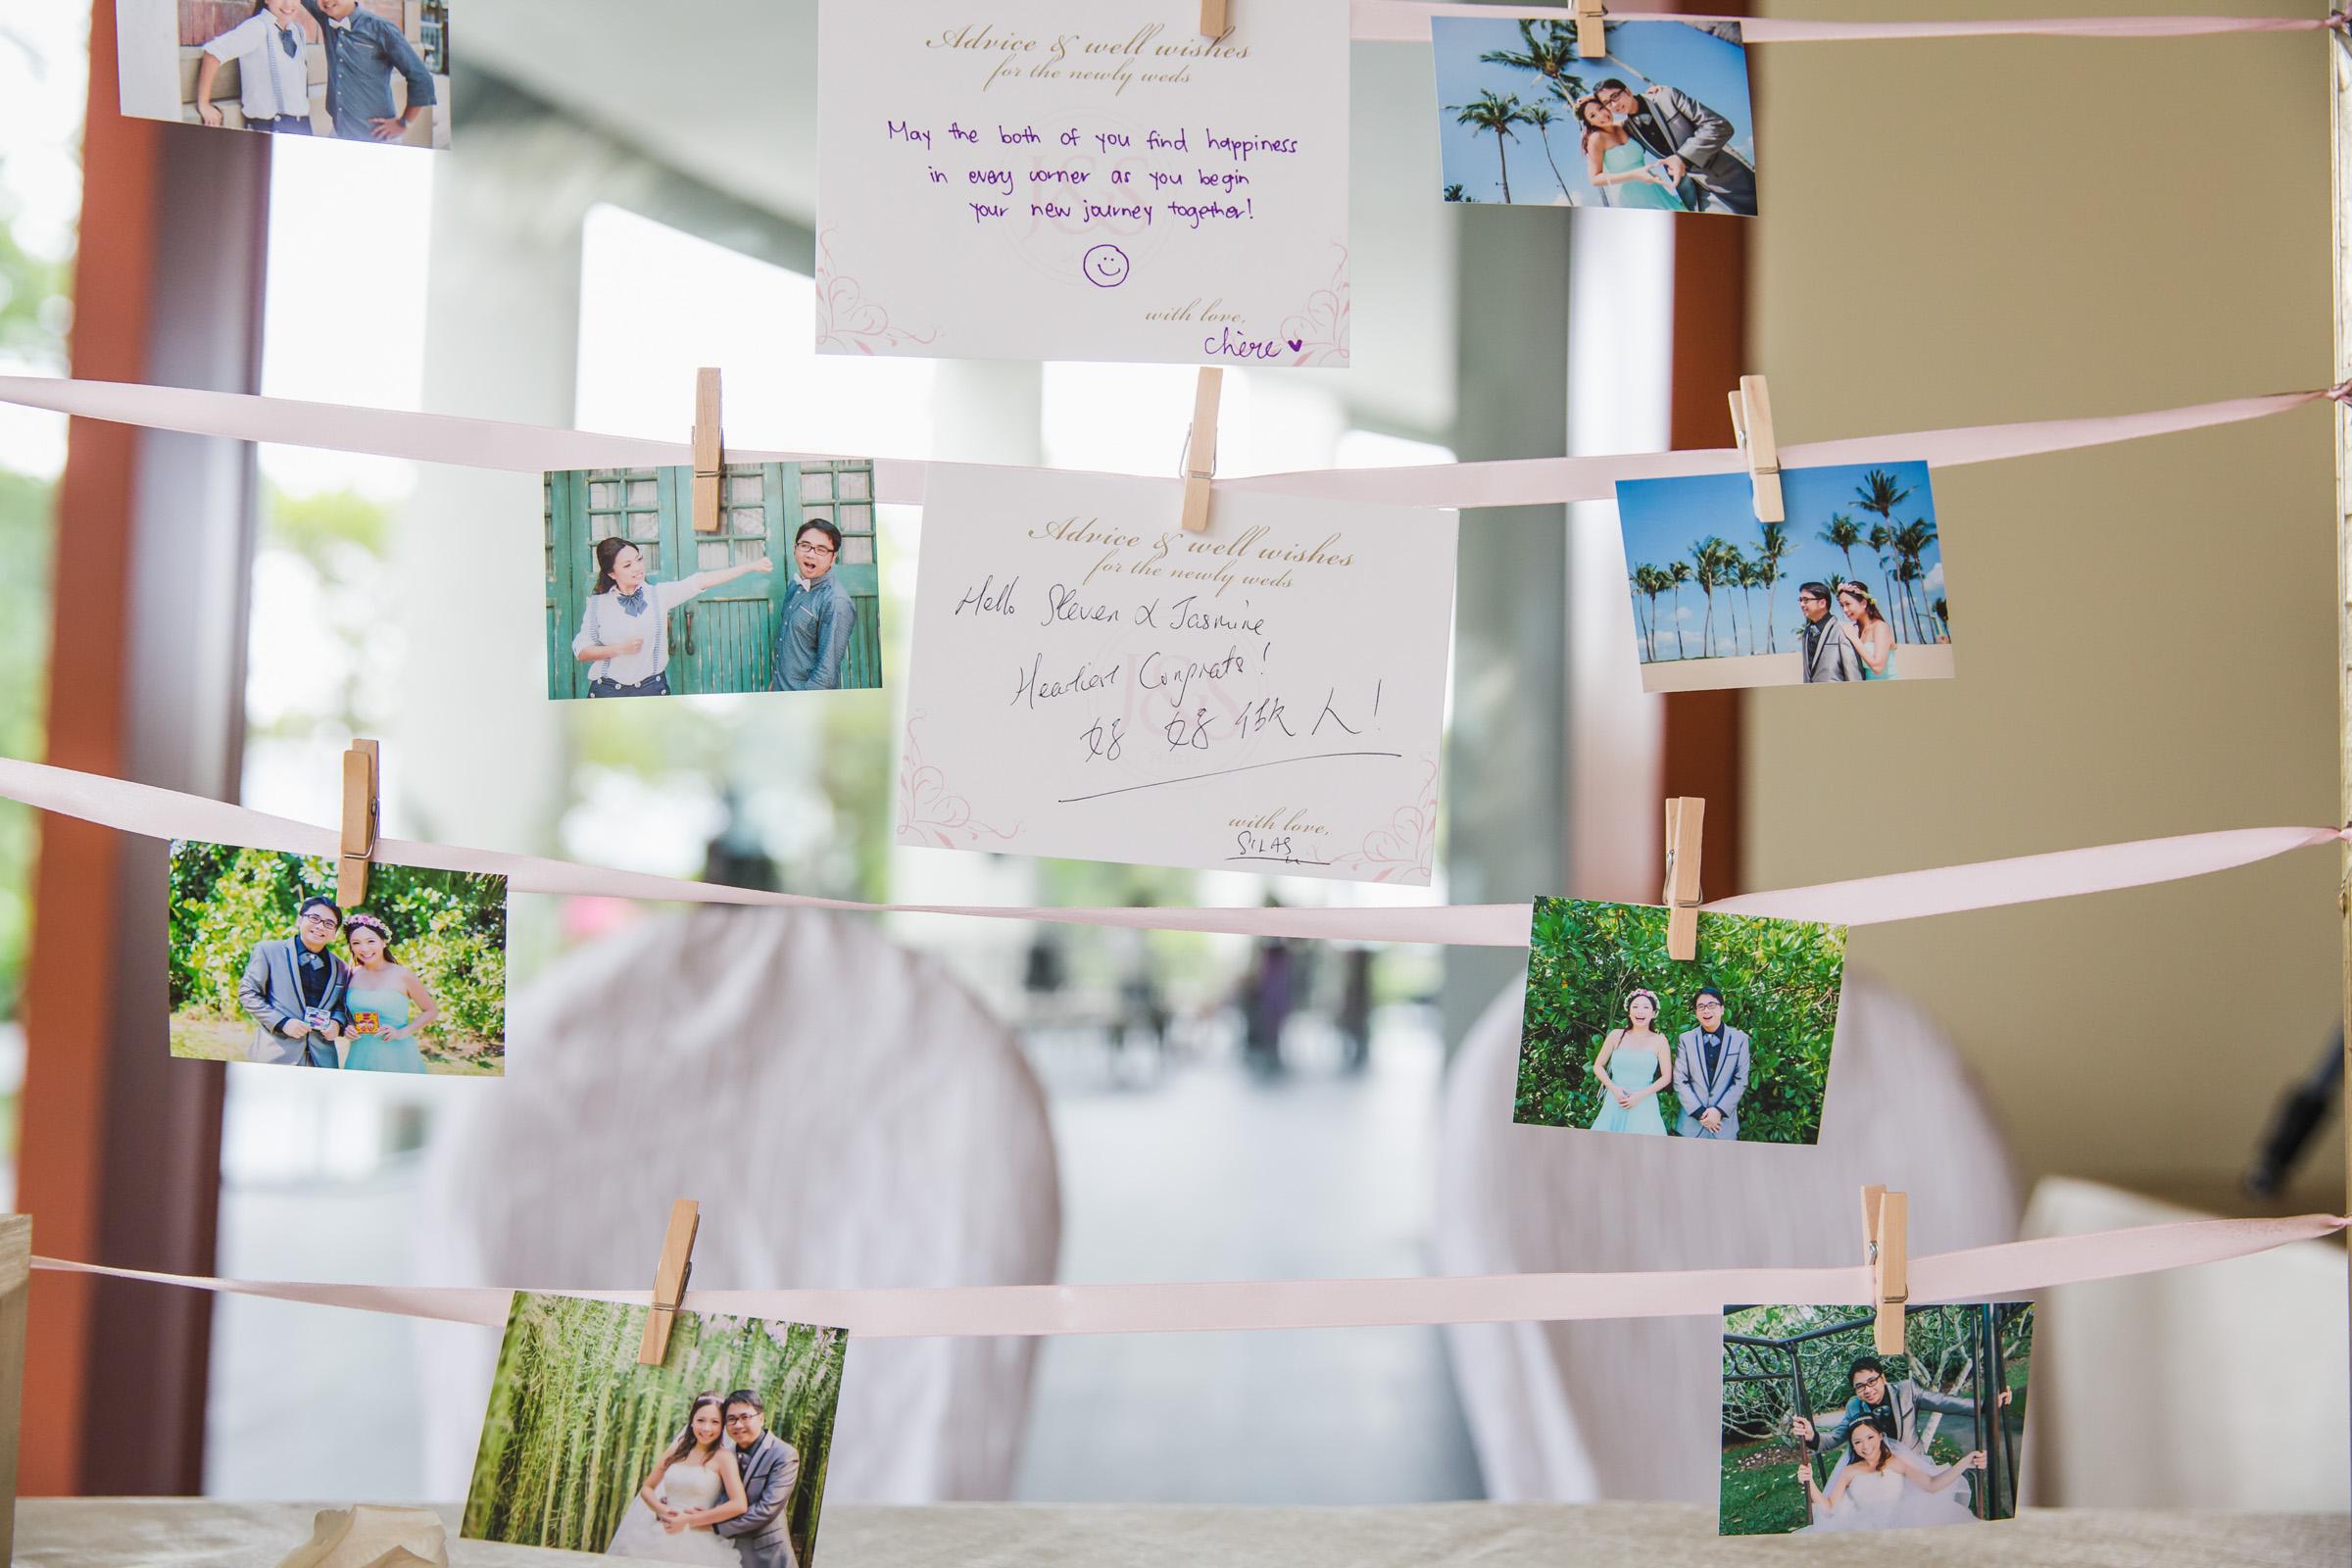 Steven_Jasmine_Wedding_Walldrobe Photography_Wedding shoots_Actual day wedding_Photographer (28)